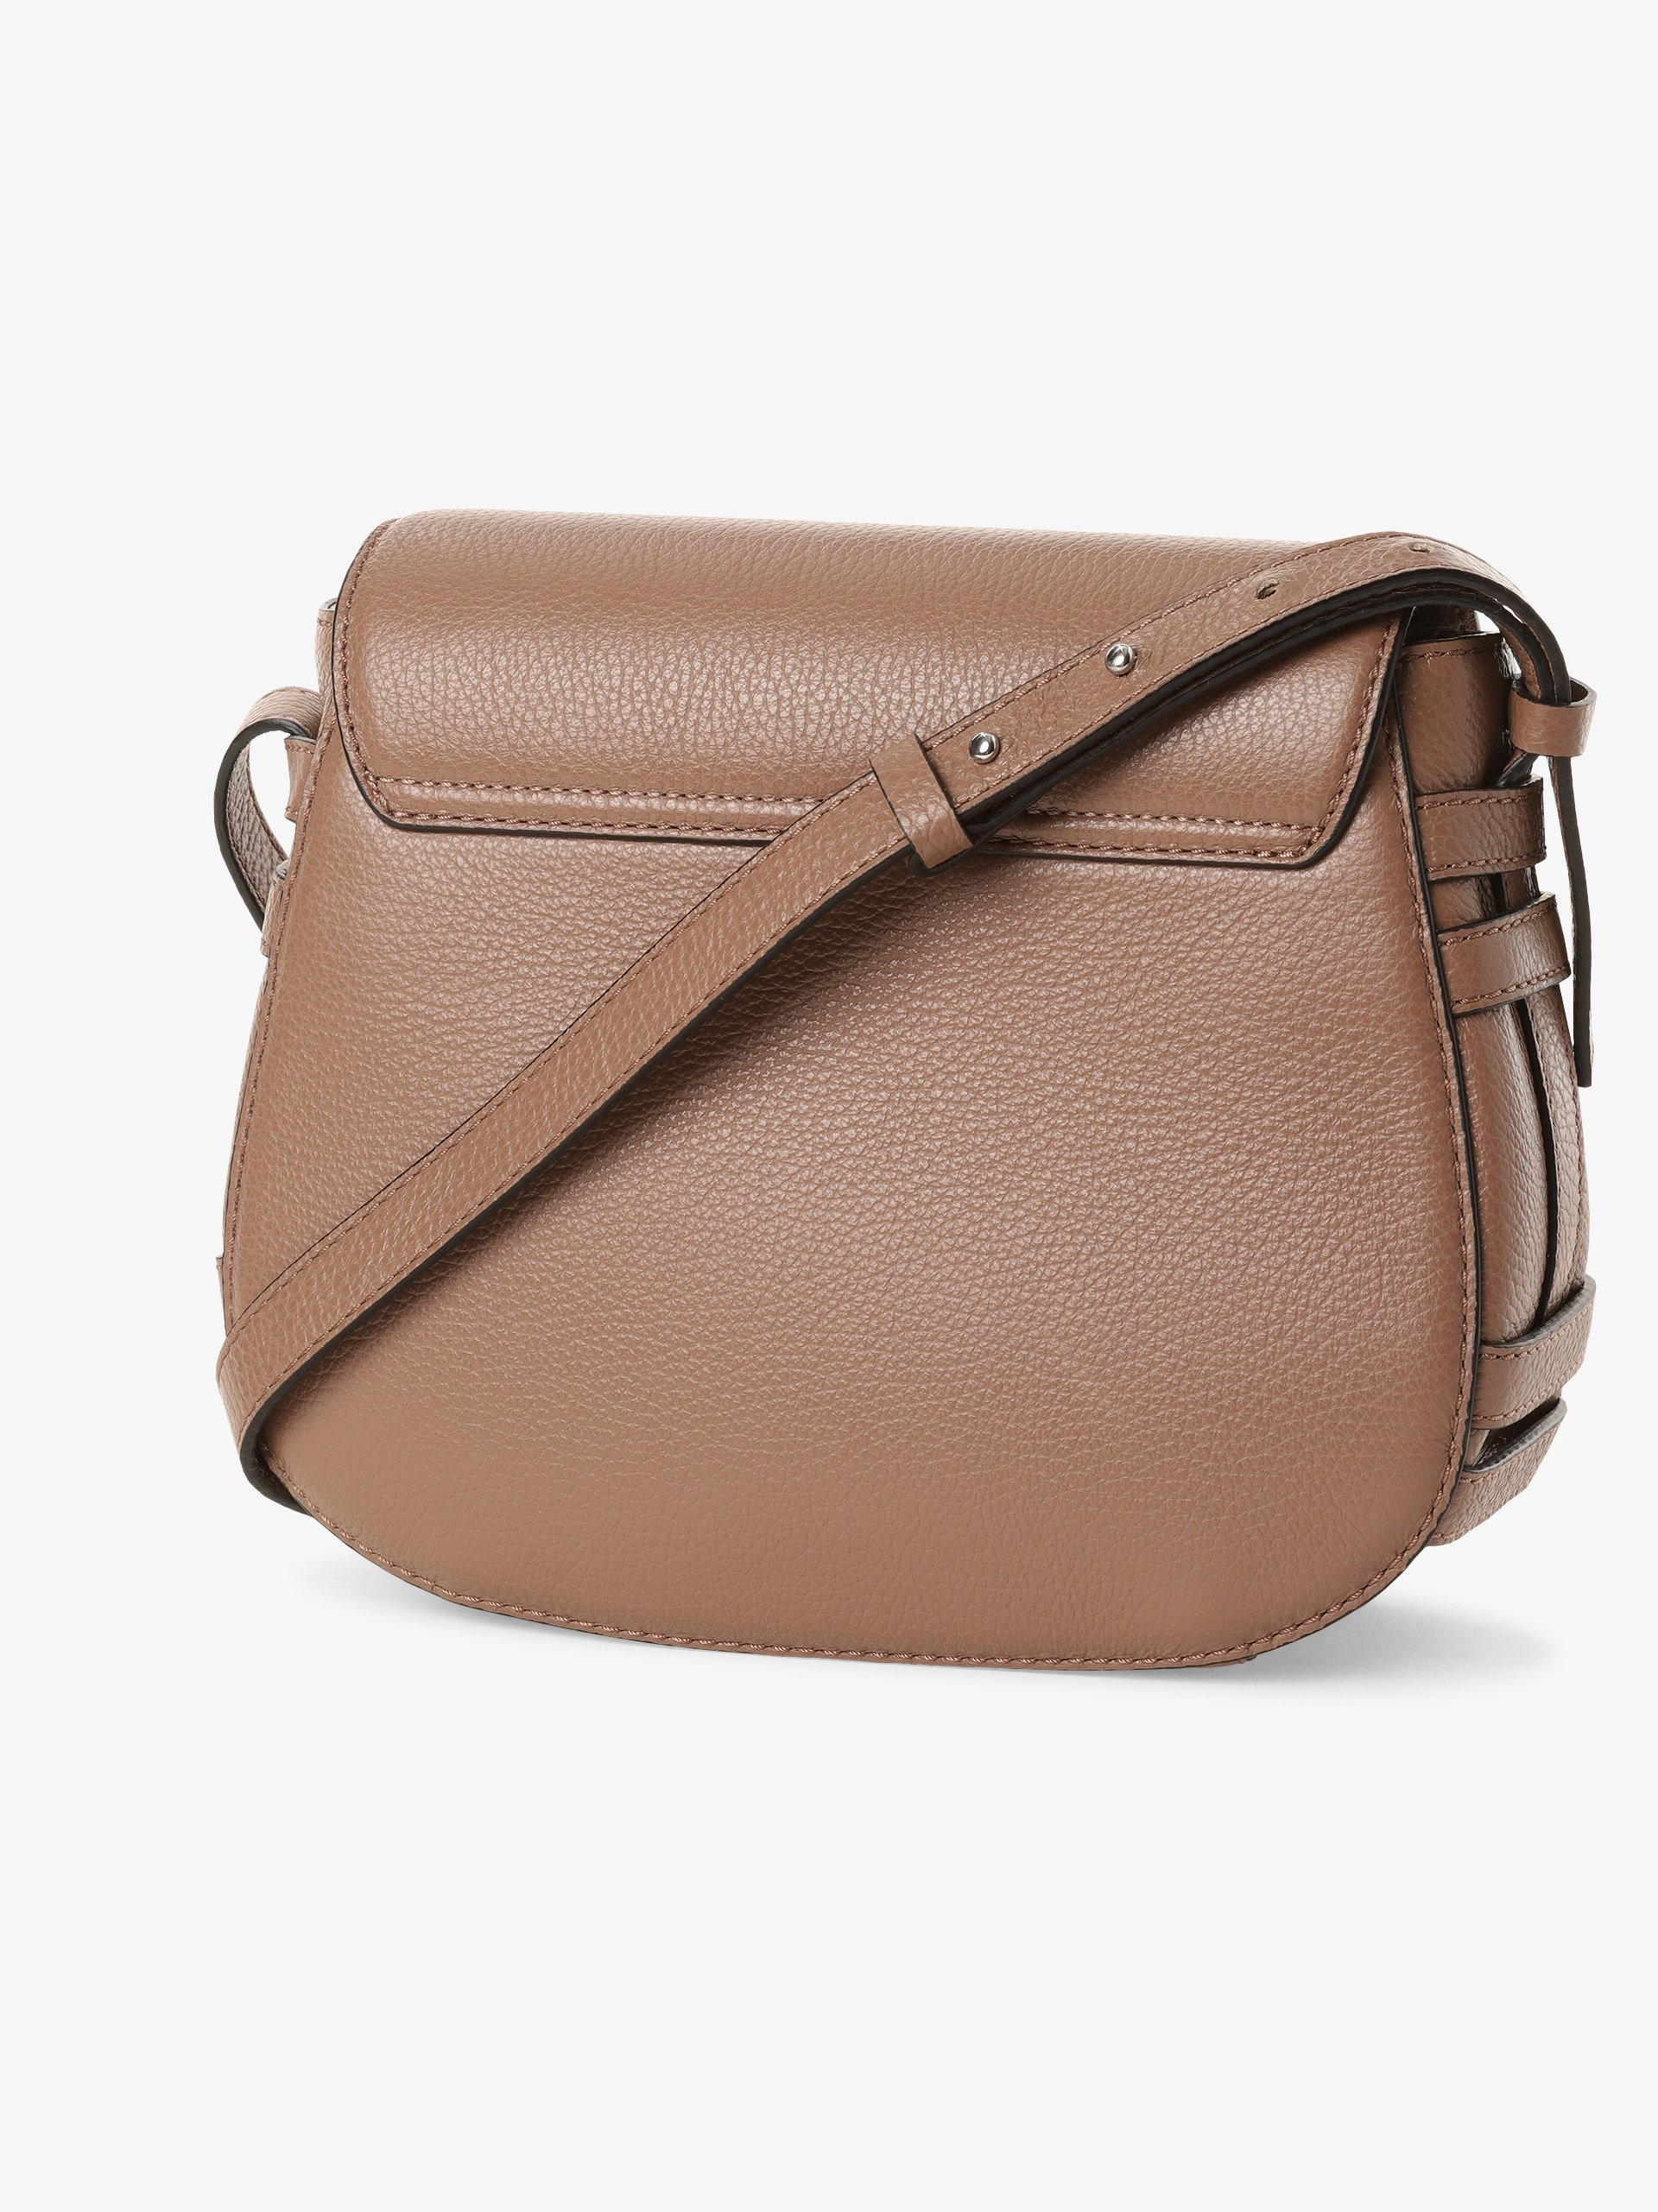 Marc Cain Bags & Shoes Damska torba na ramię ze skóry